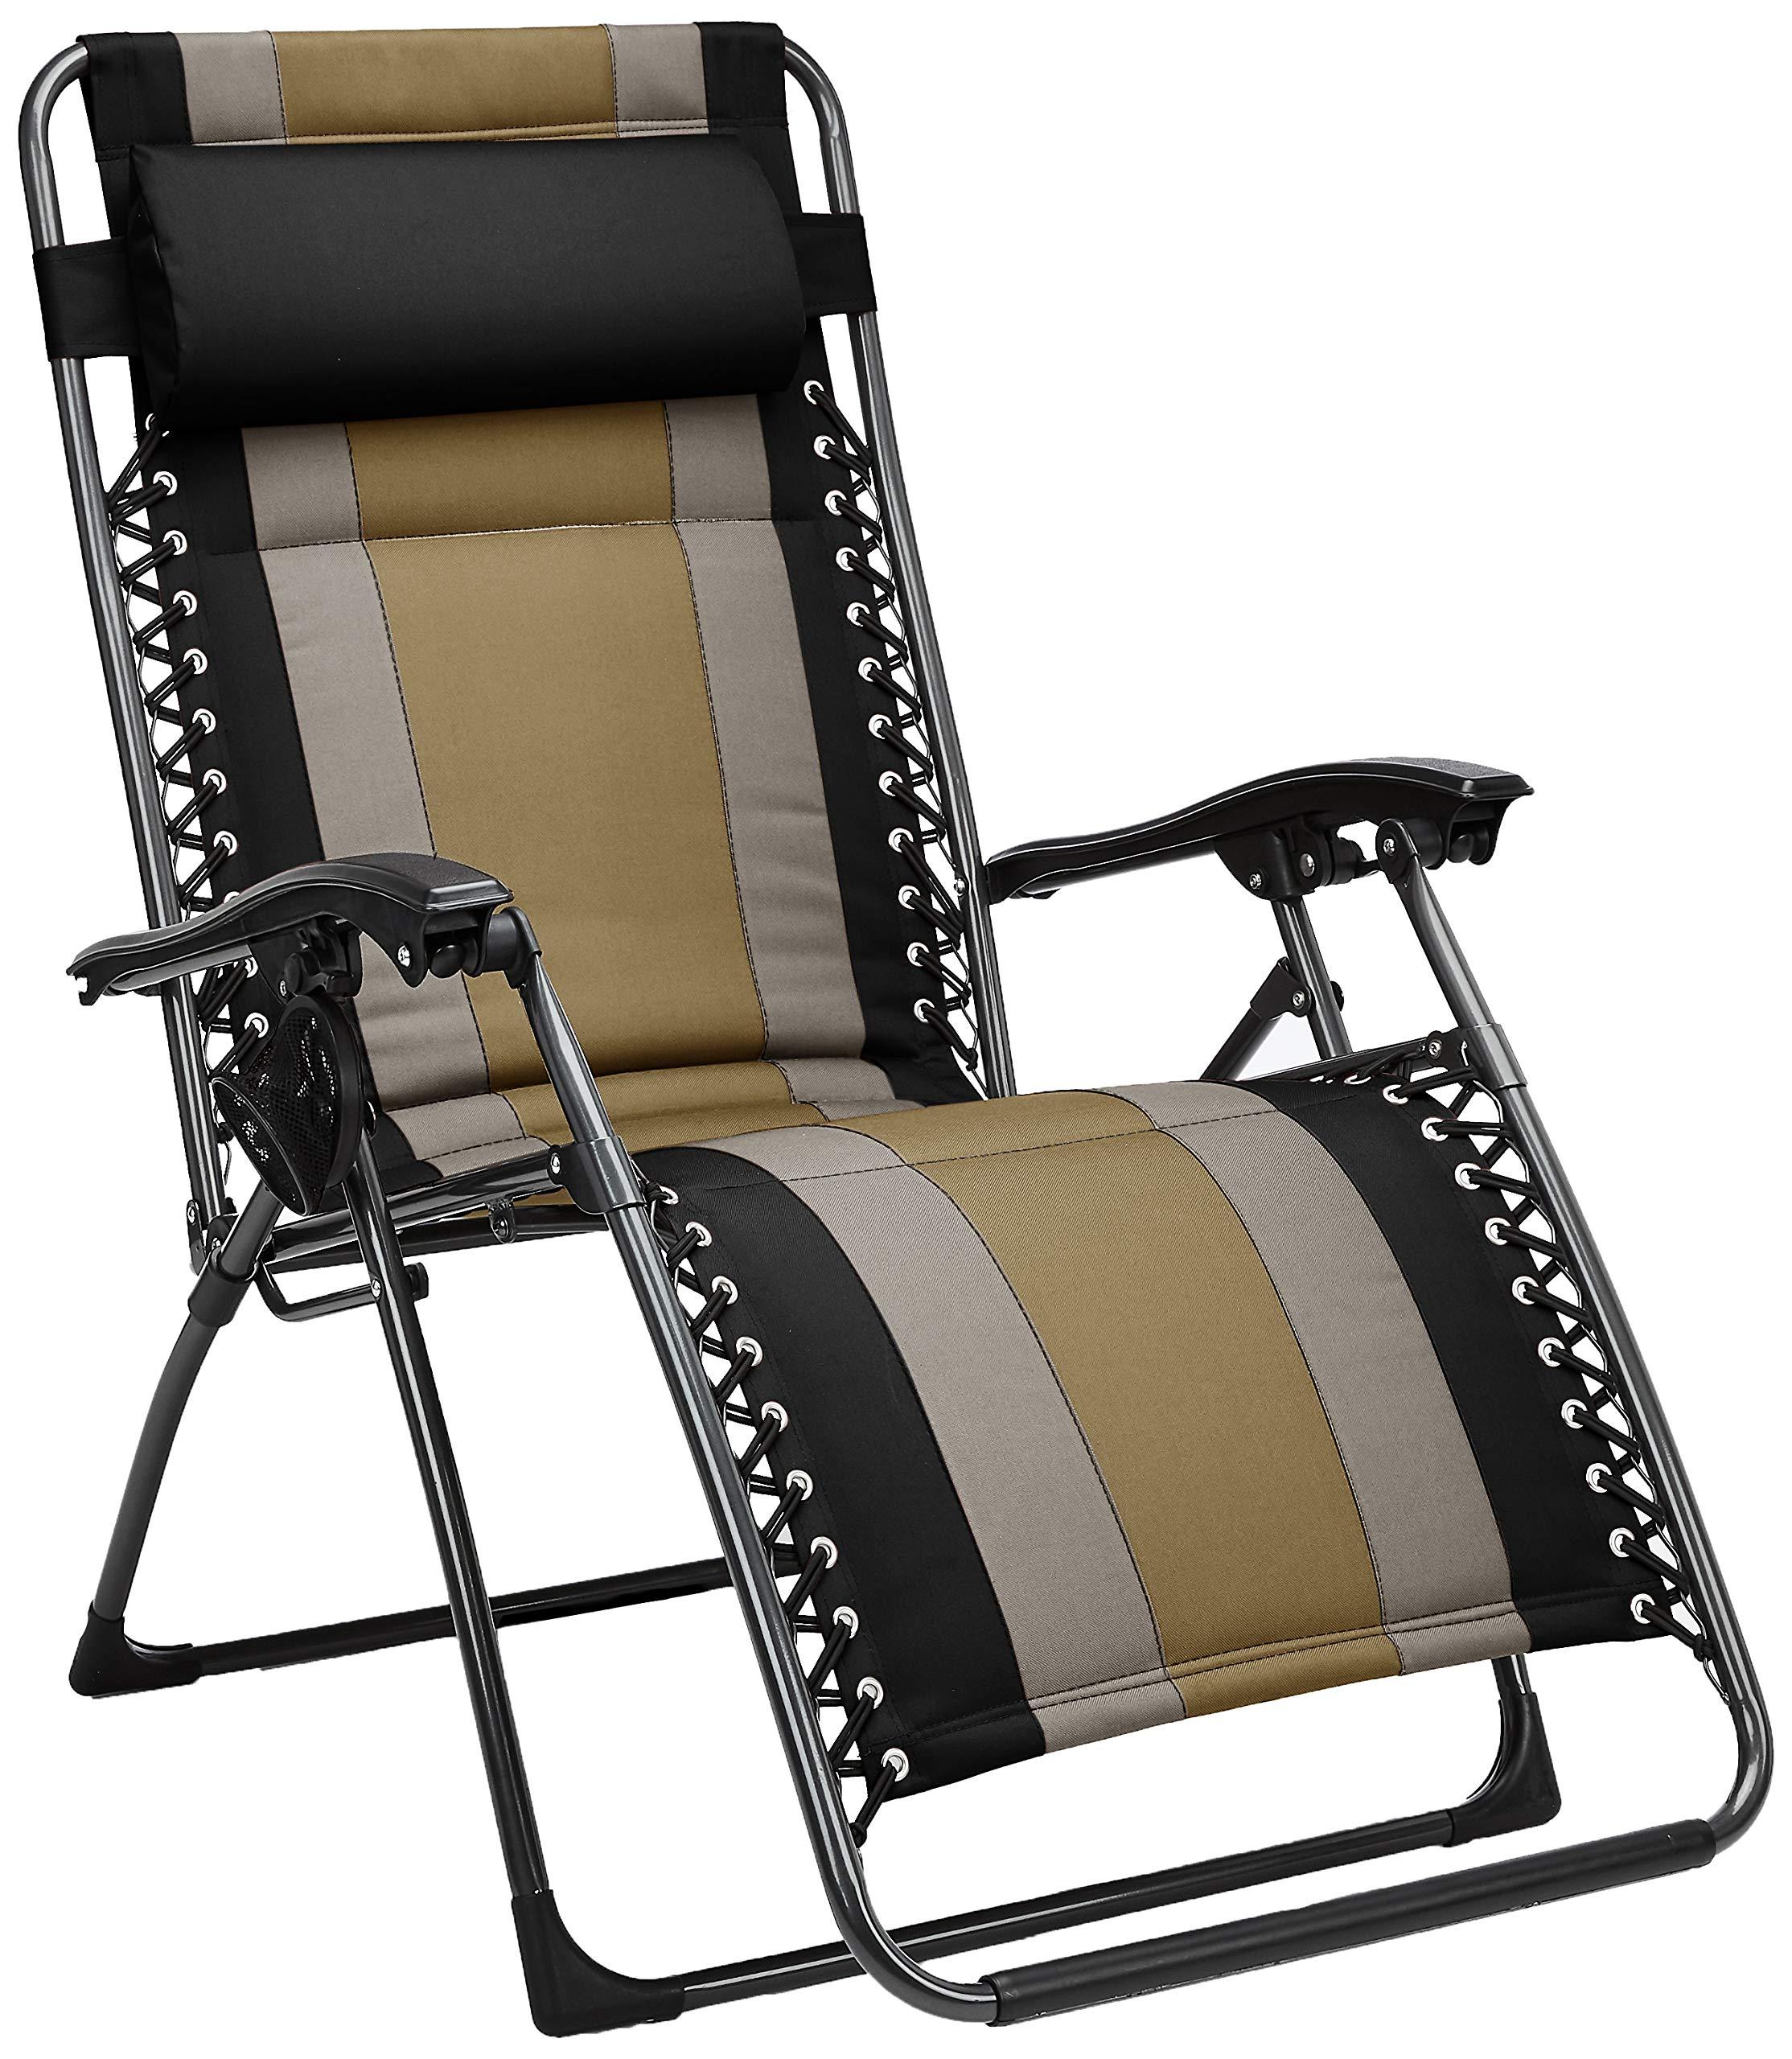 AmazonBasics Padded Zero Gravity Chair- Black by AmazonBasics